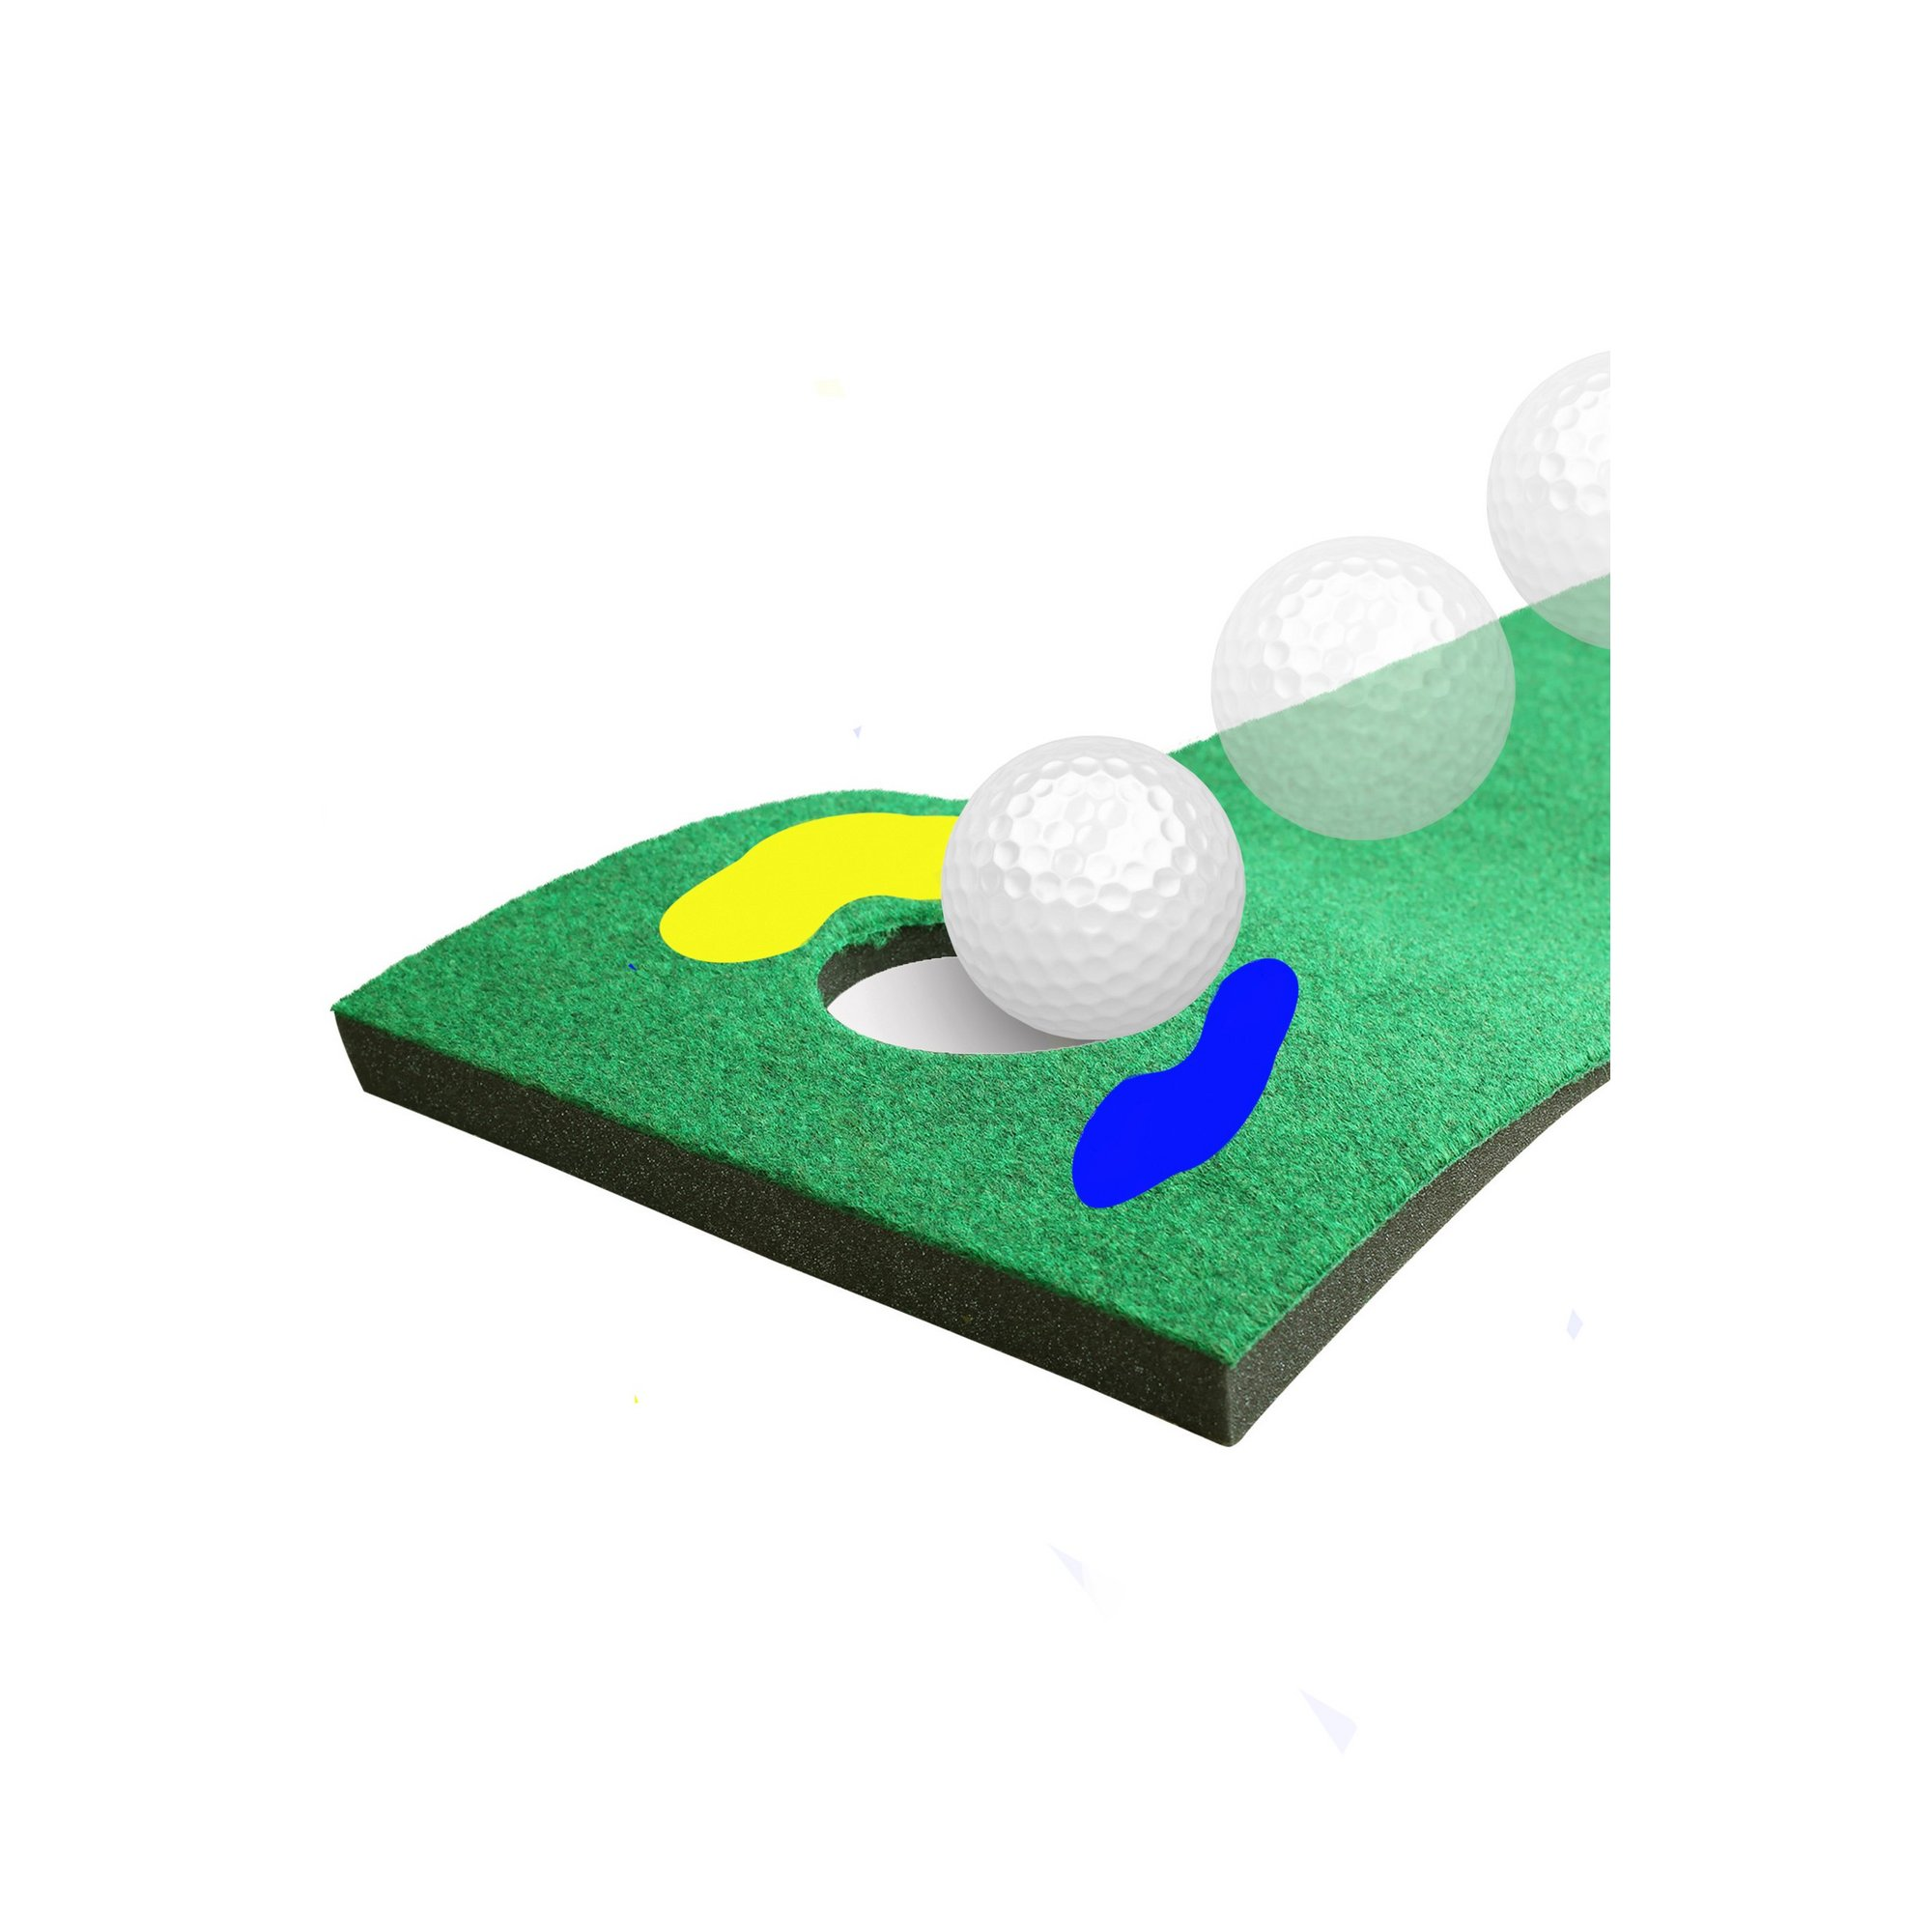 Image of Longridge Deluxe Golf Putting Mat